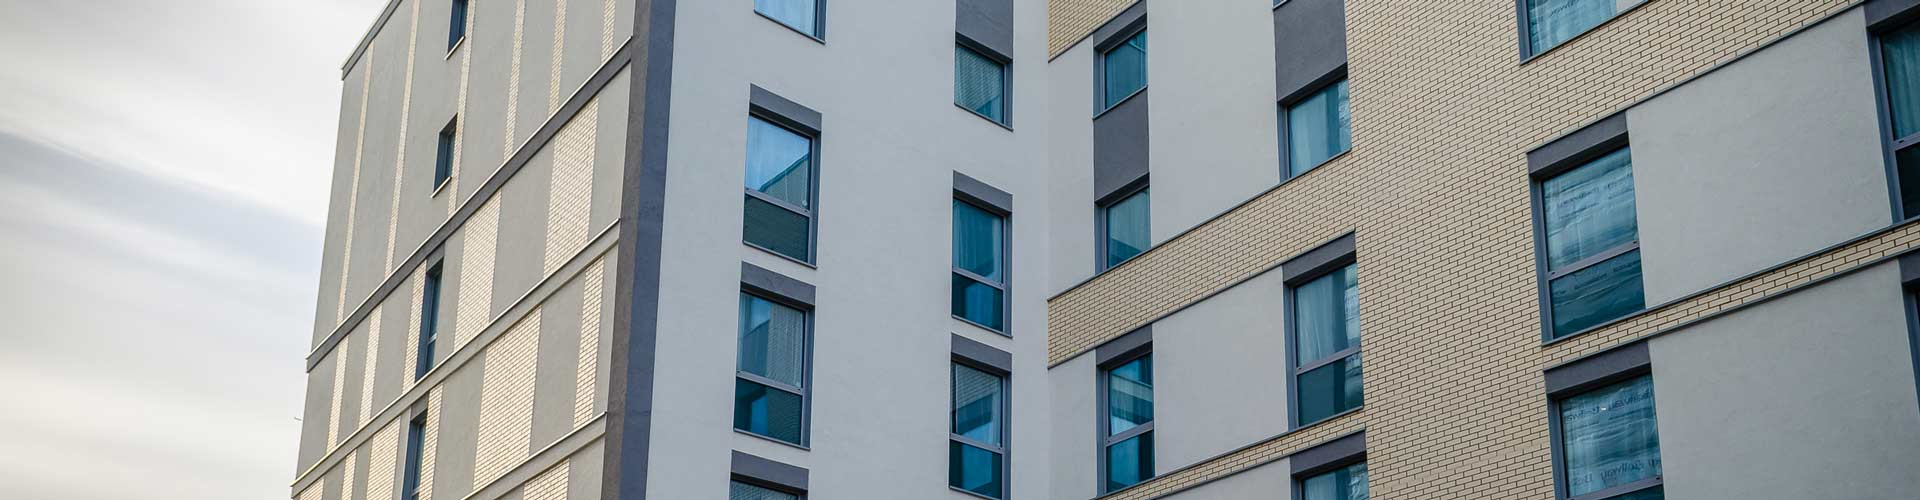 Insulated Render T&T Facades Premier Inn Slough